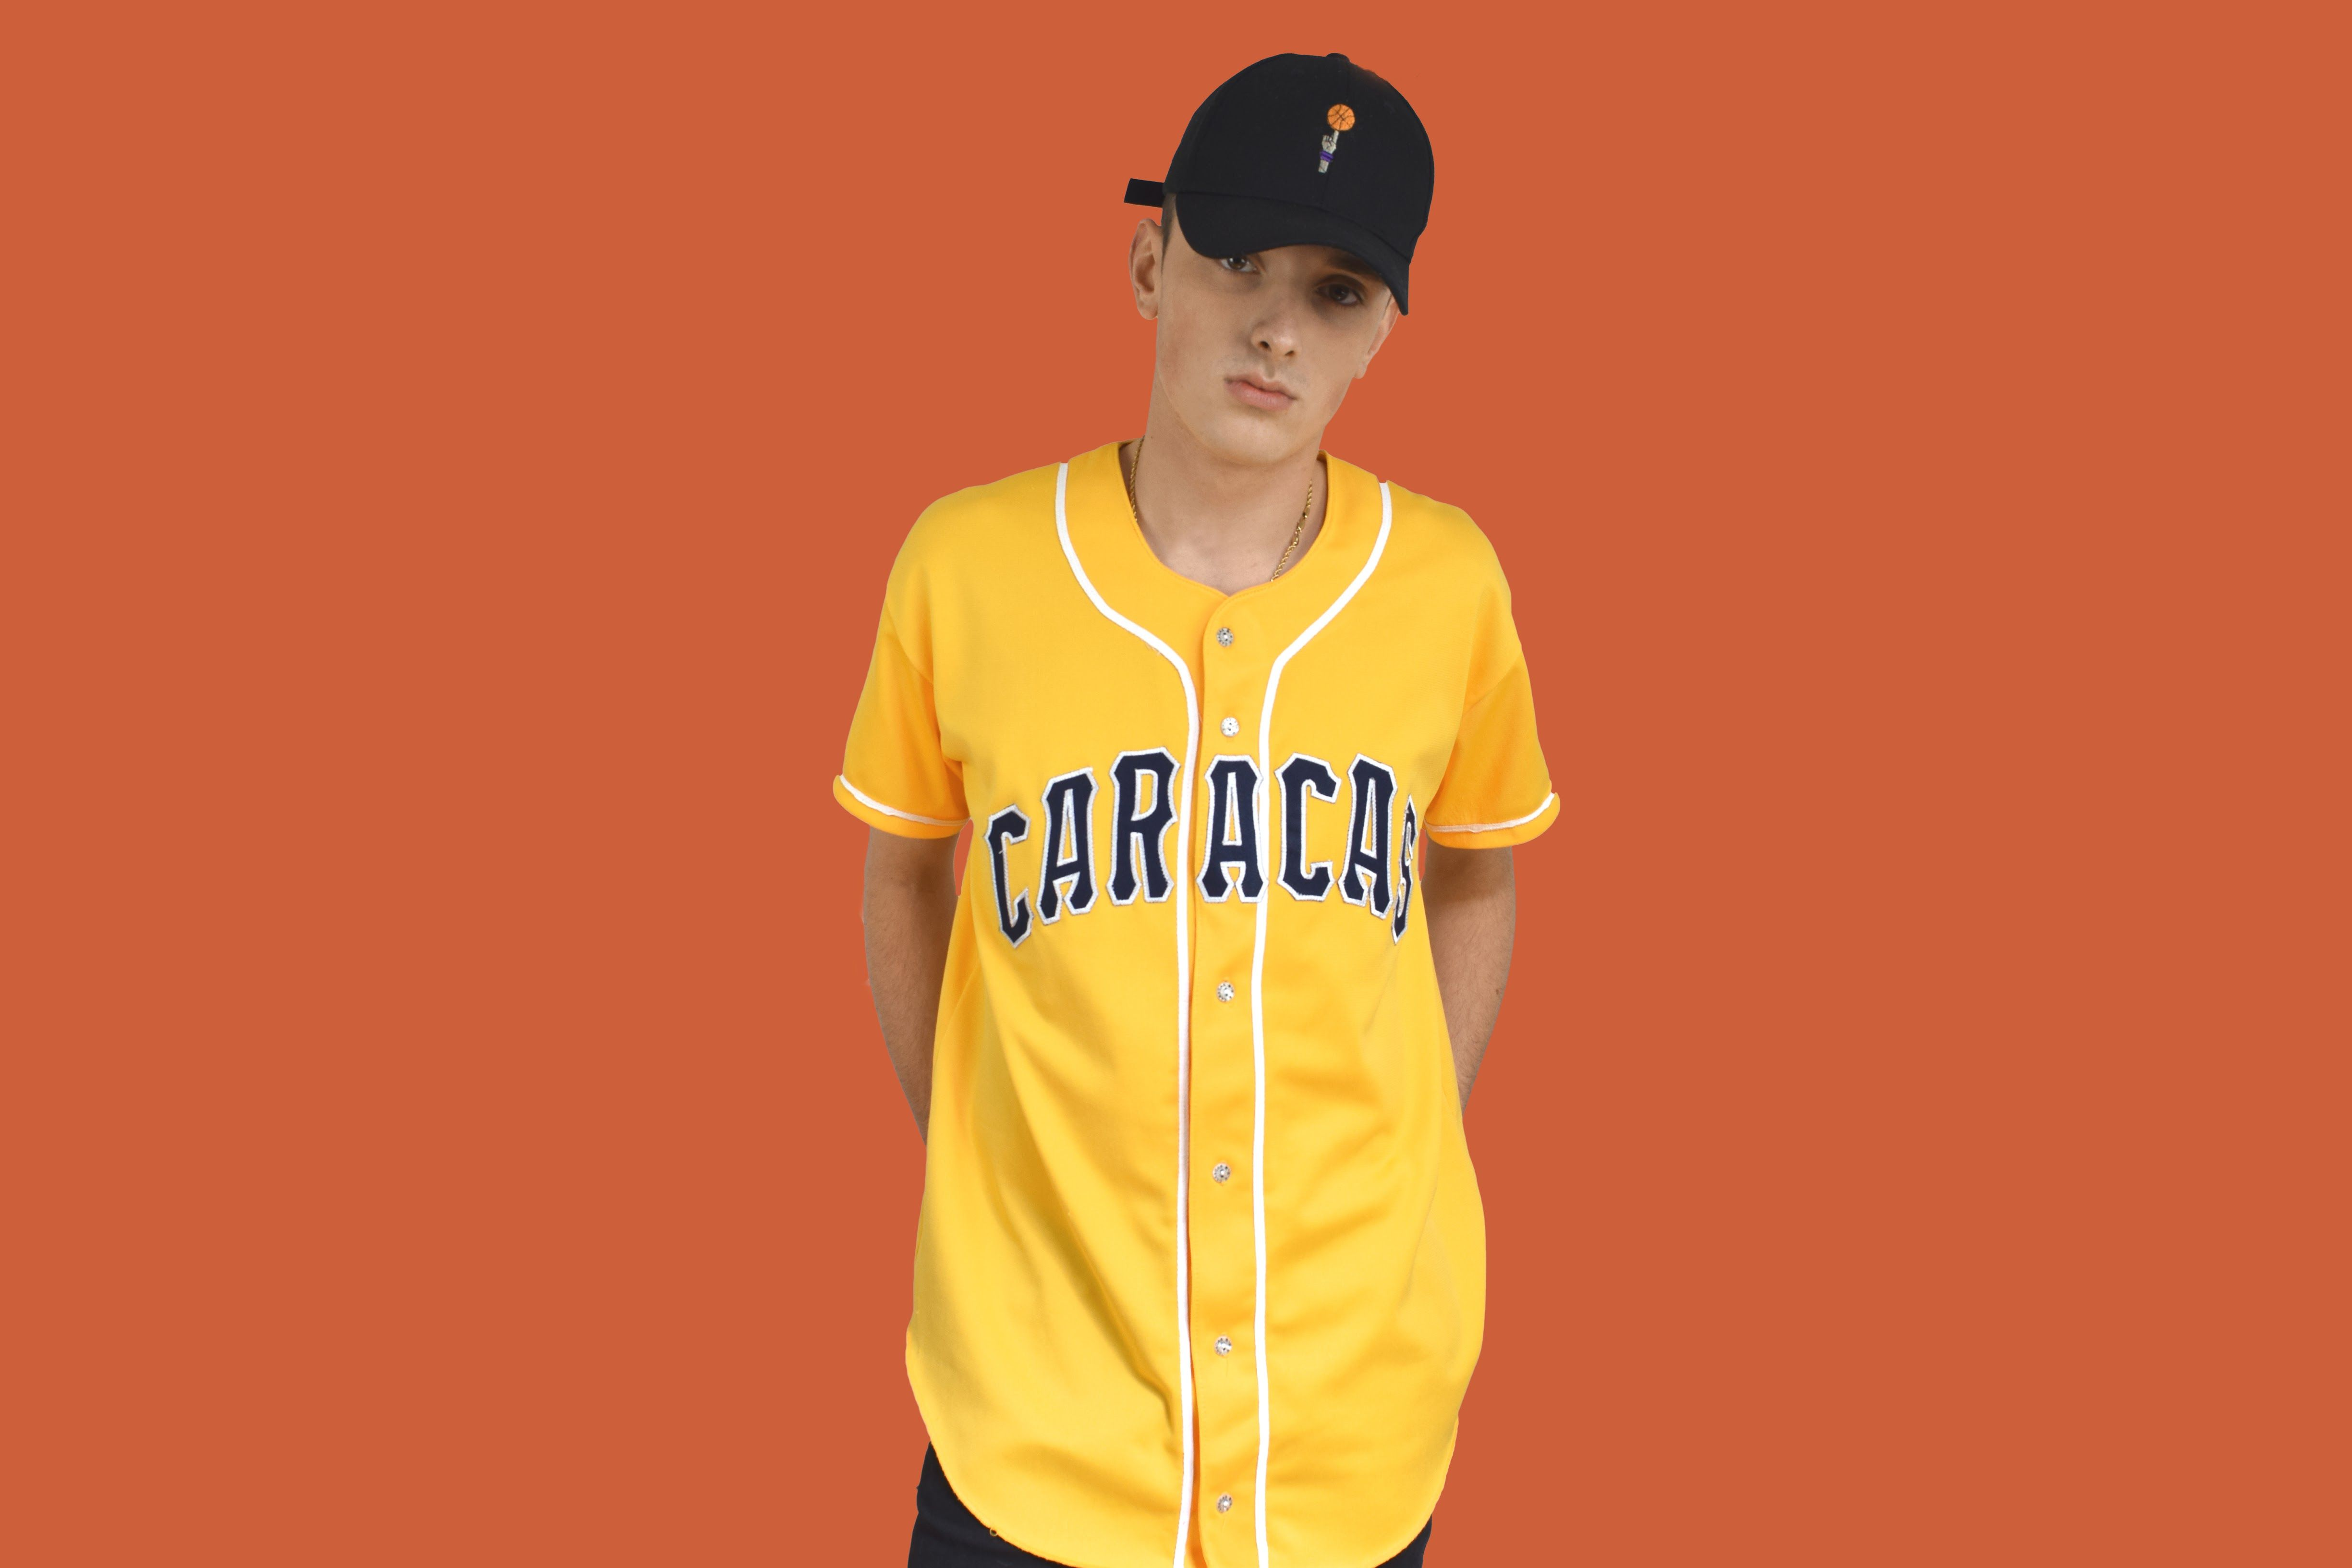 ec9898befa8b5 Camisa amarilla beisbol CARACAS. Moda vintage. Kaamul Vintage. Ropa  americana.